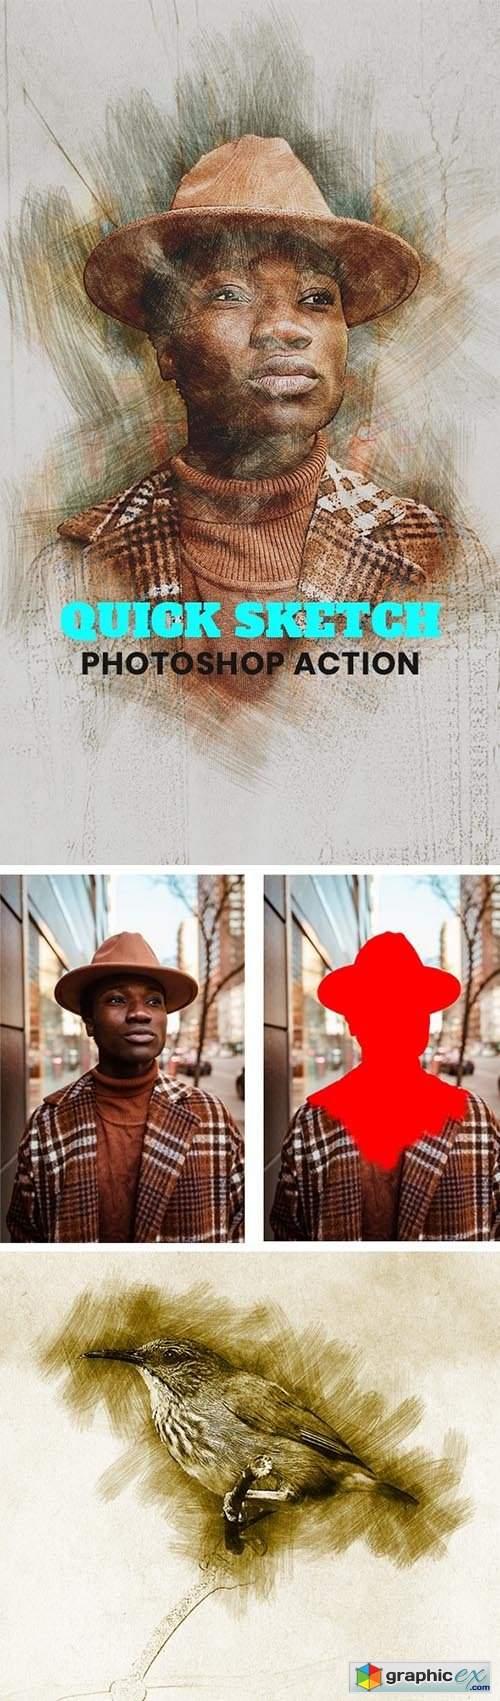 Quick Sketch Photoshop Action 31762904